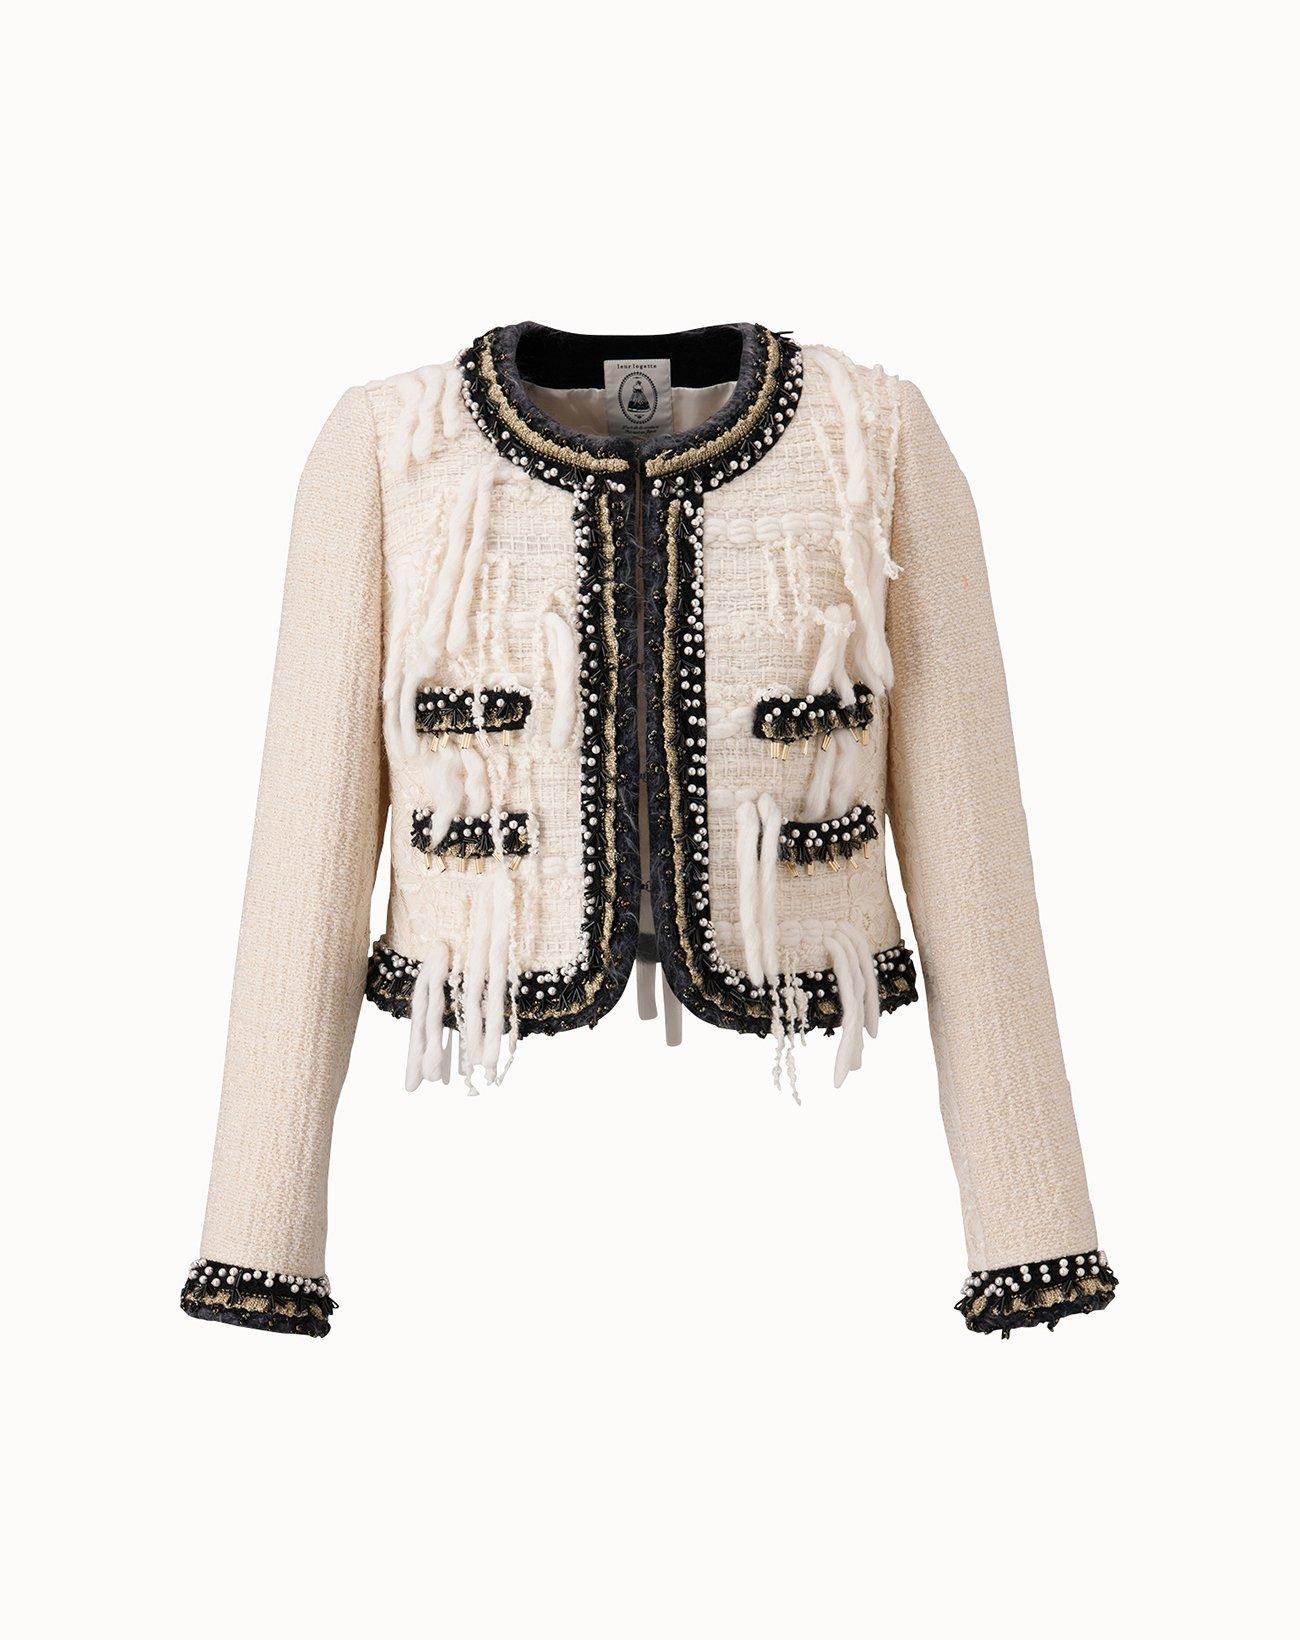 Roving Tweed Jacket - Off White